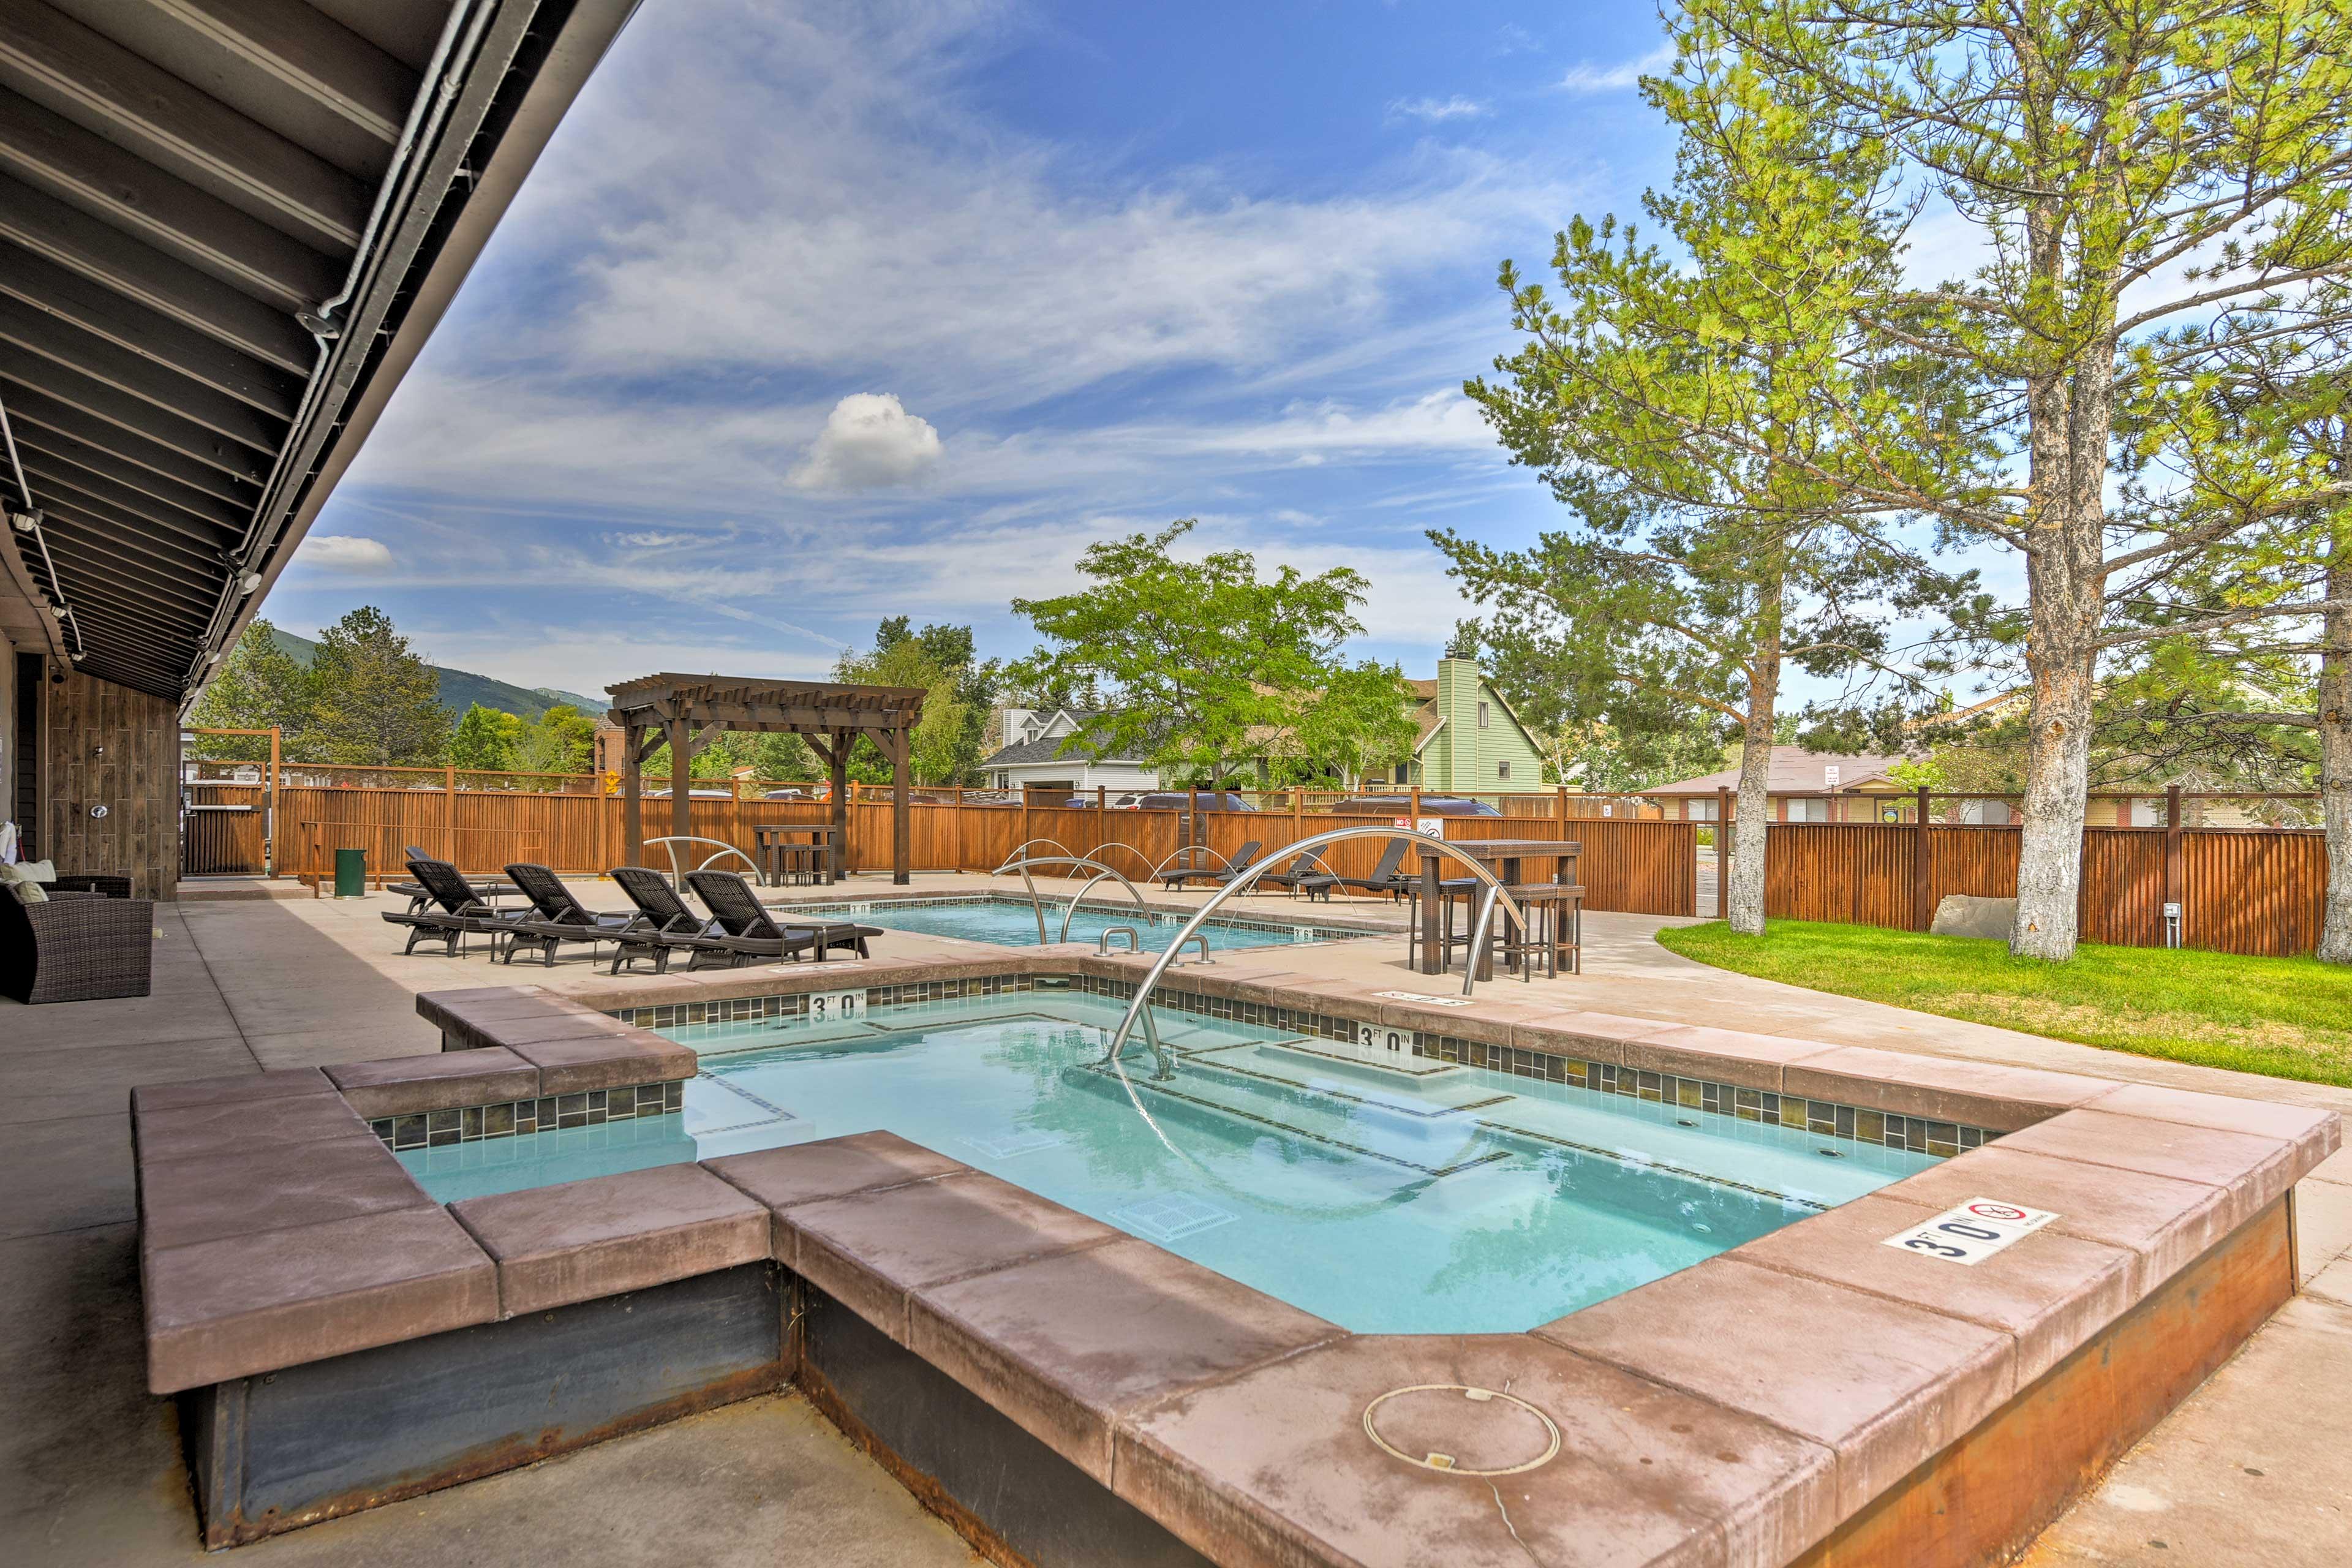 Make a splash in the community pool as you soak up the Utah sunshine.